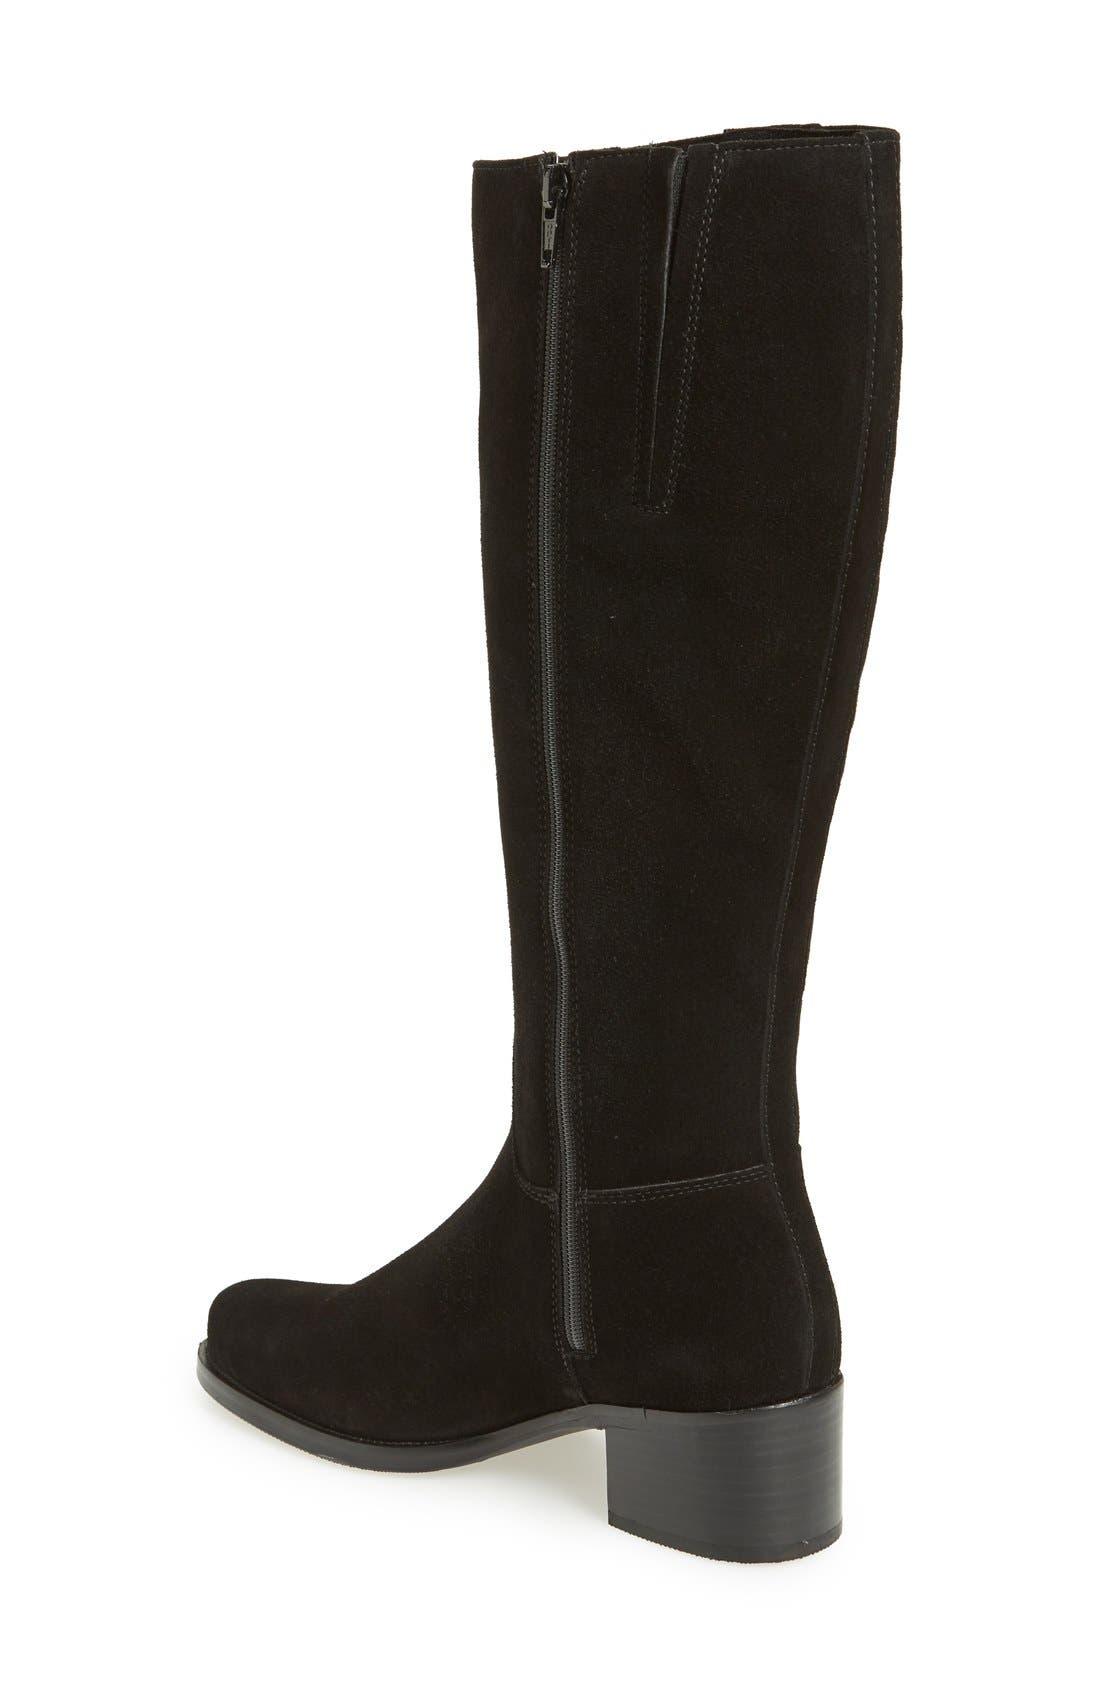 LA CANADIENNE, 'Polly' Waterproof Knee High Boot, Alternate thumbnail 2, color, BLACK SUEDE